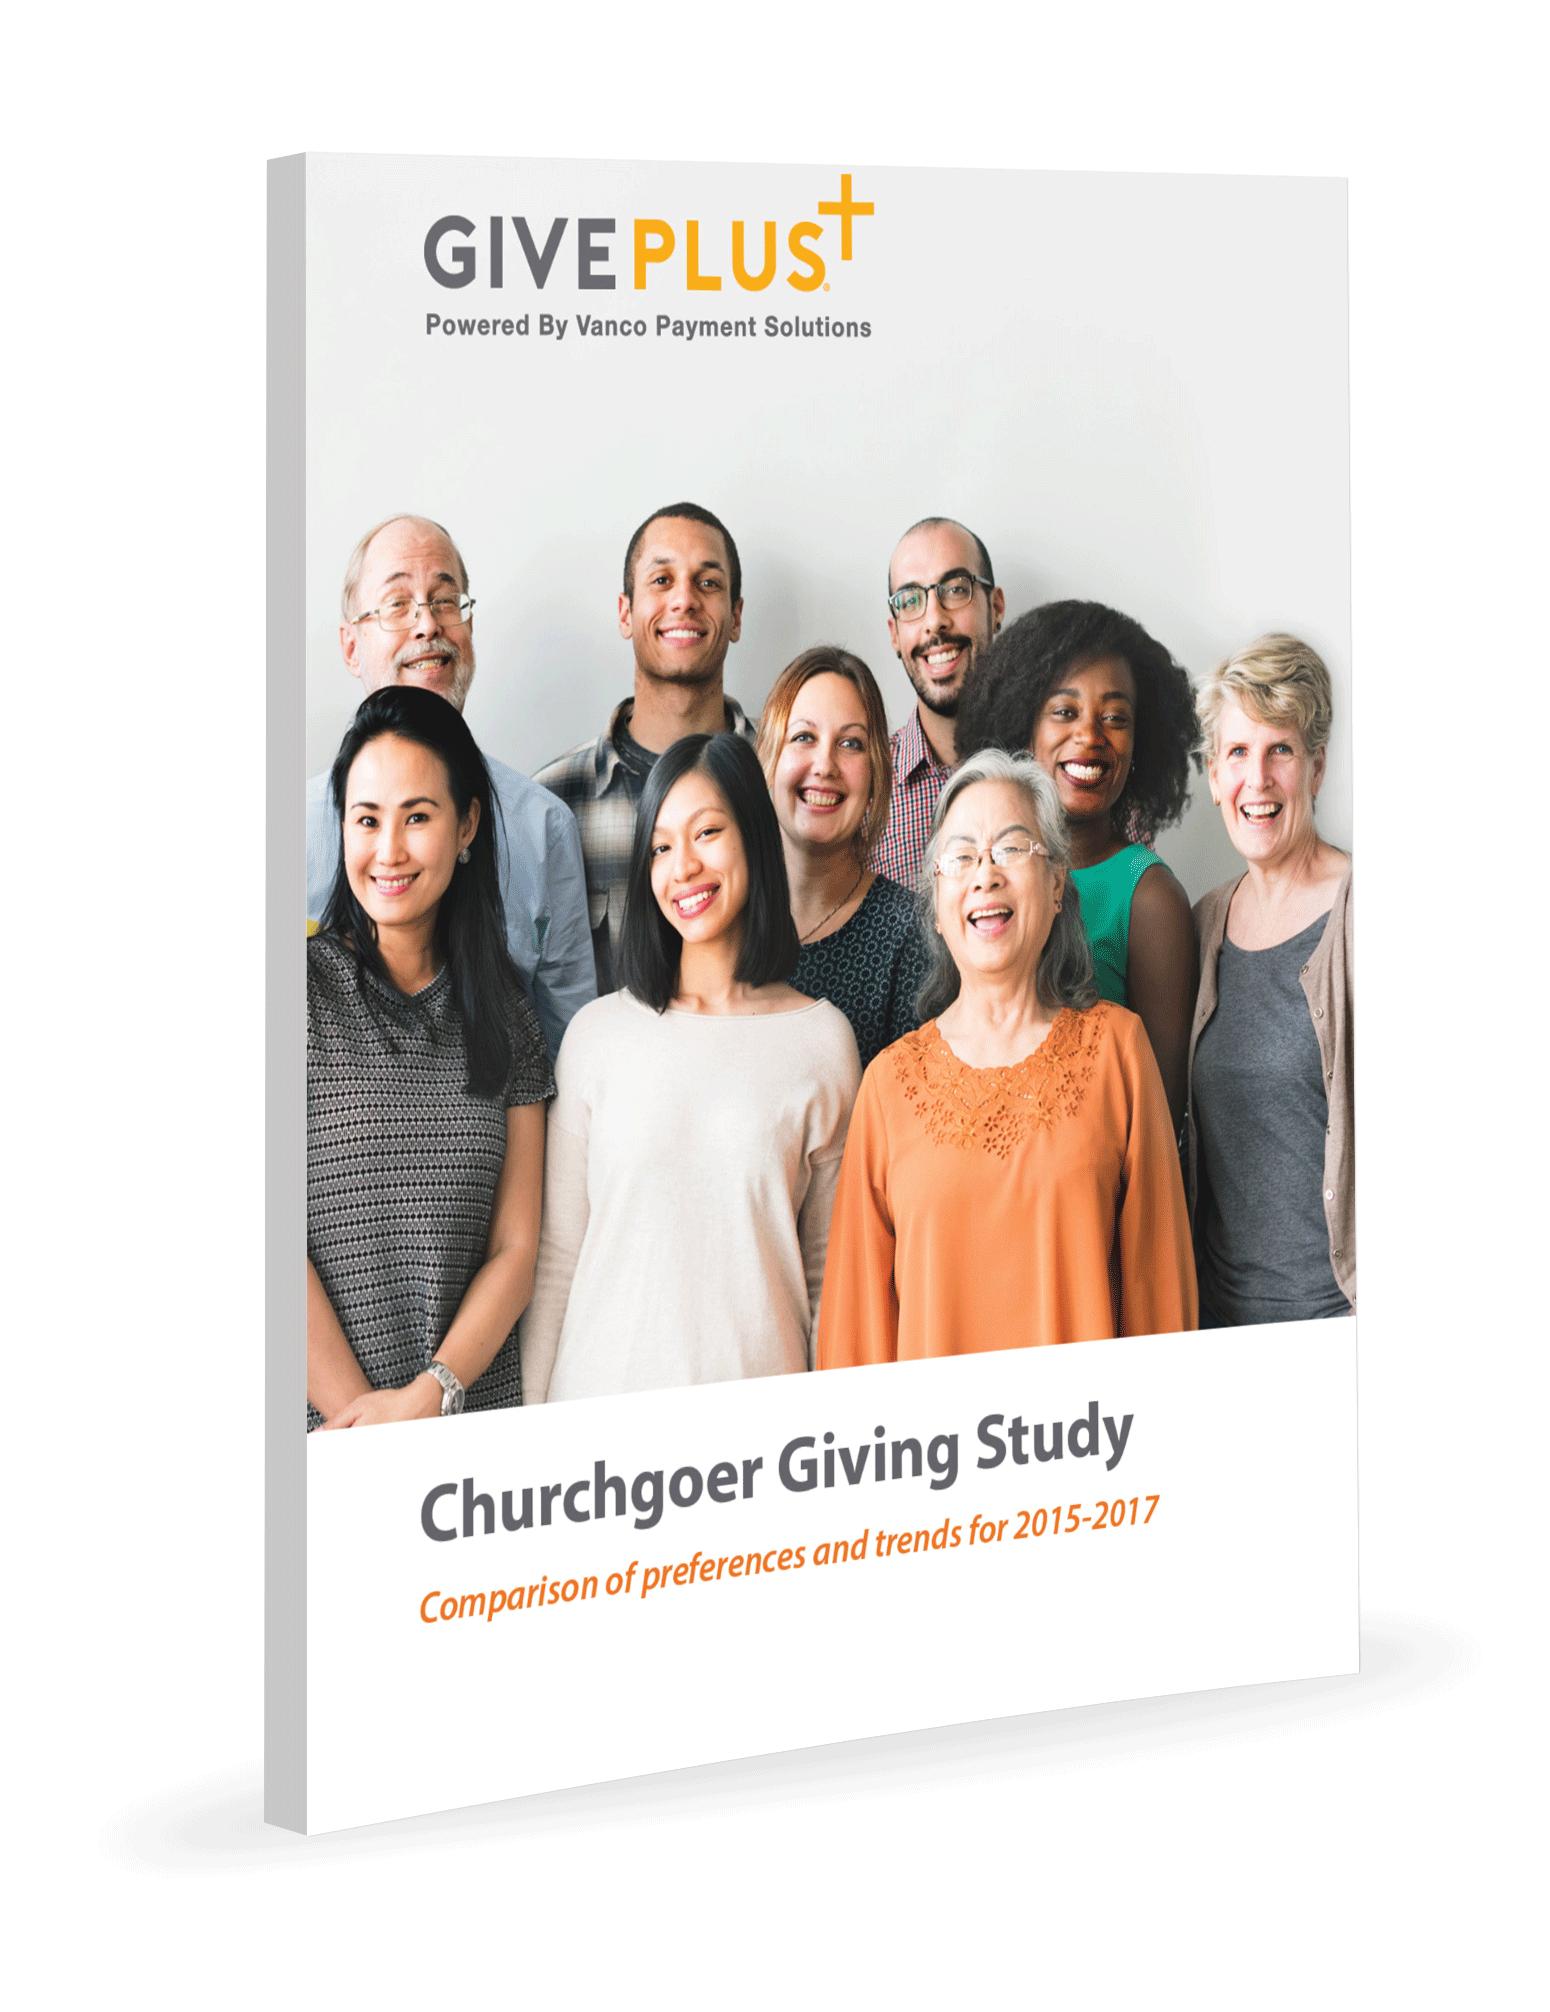 Churchgoer Giving Study Findings Report 2015-2017